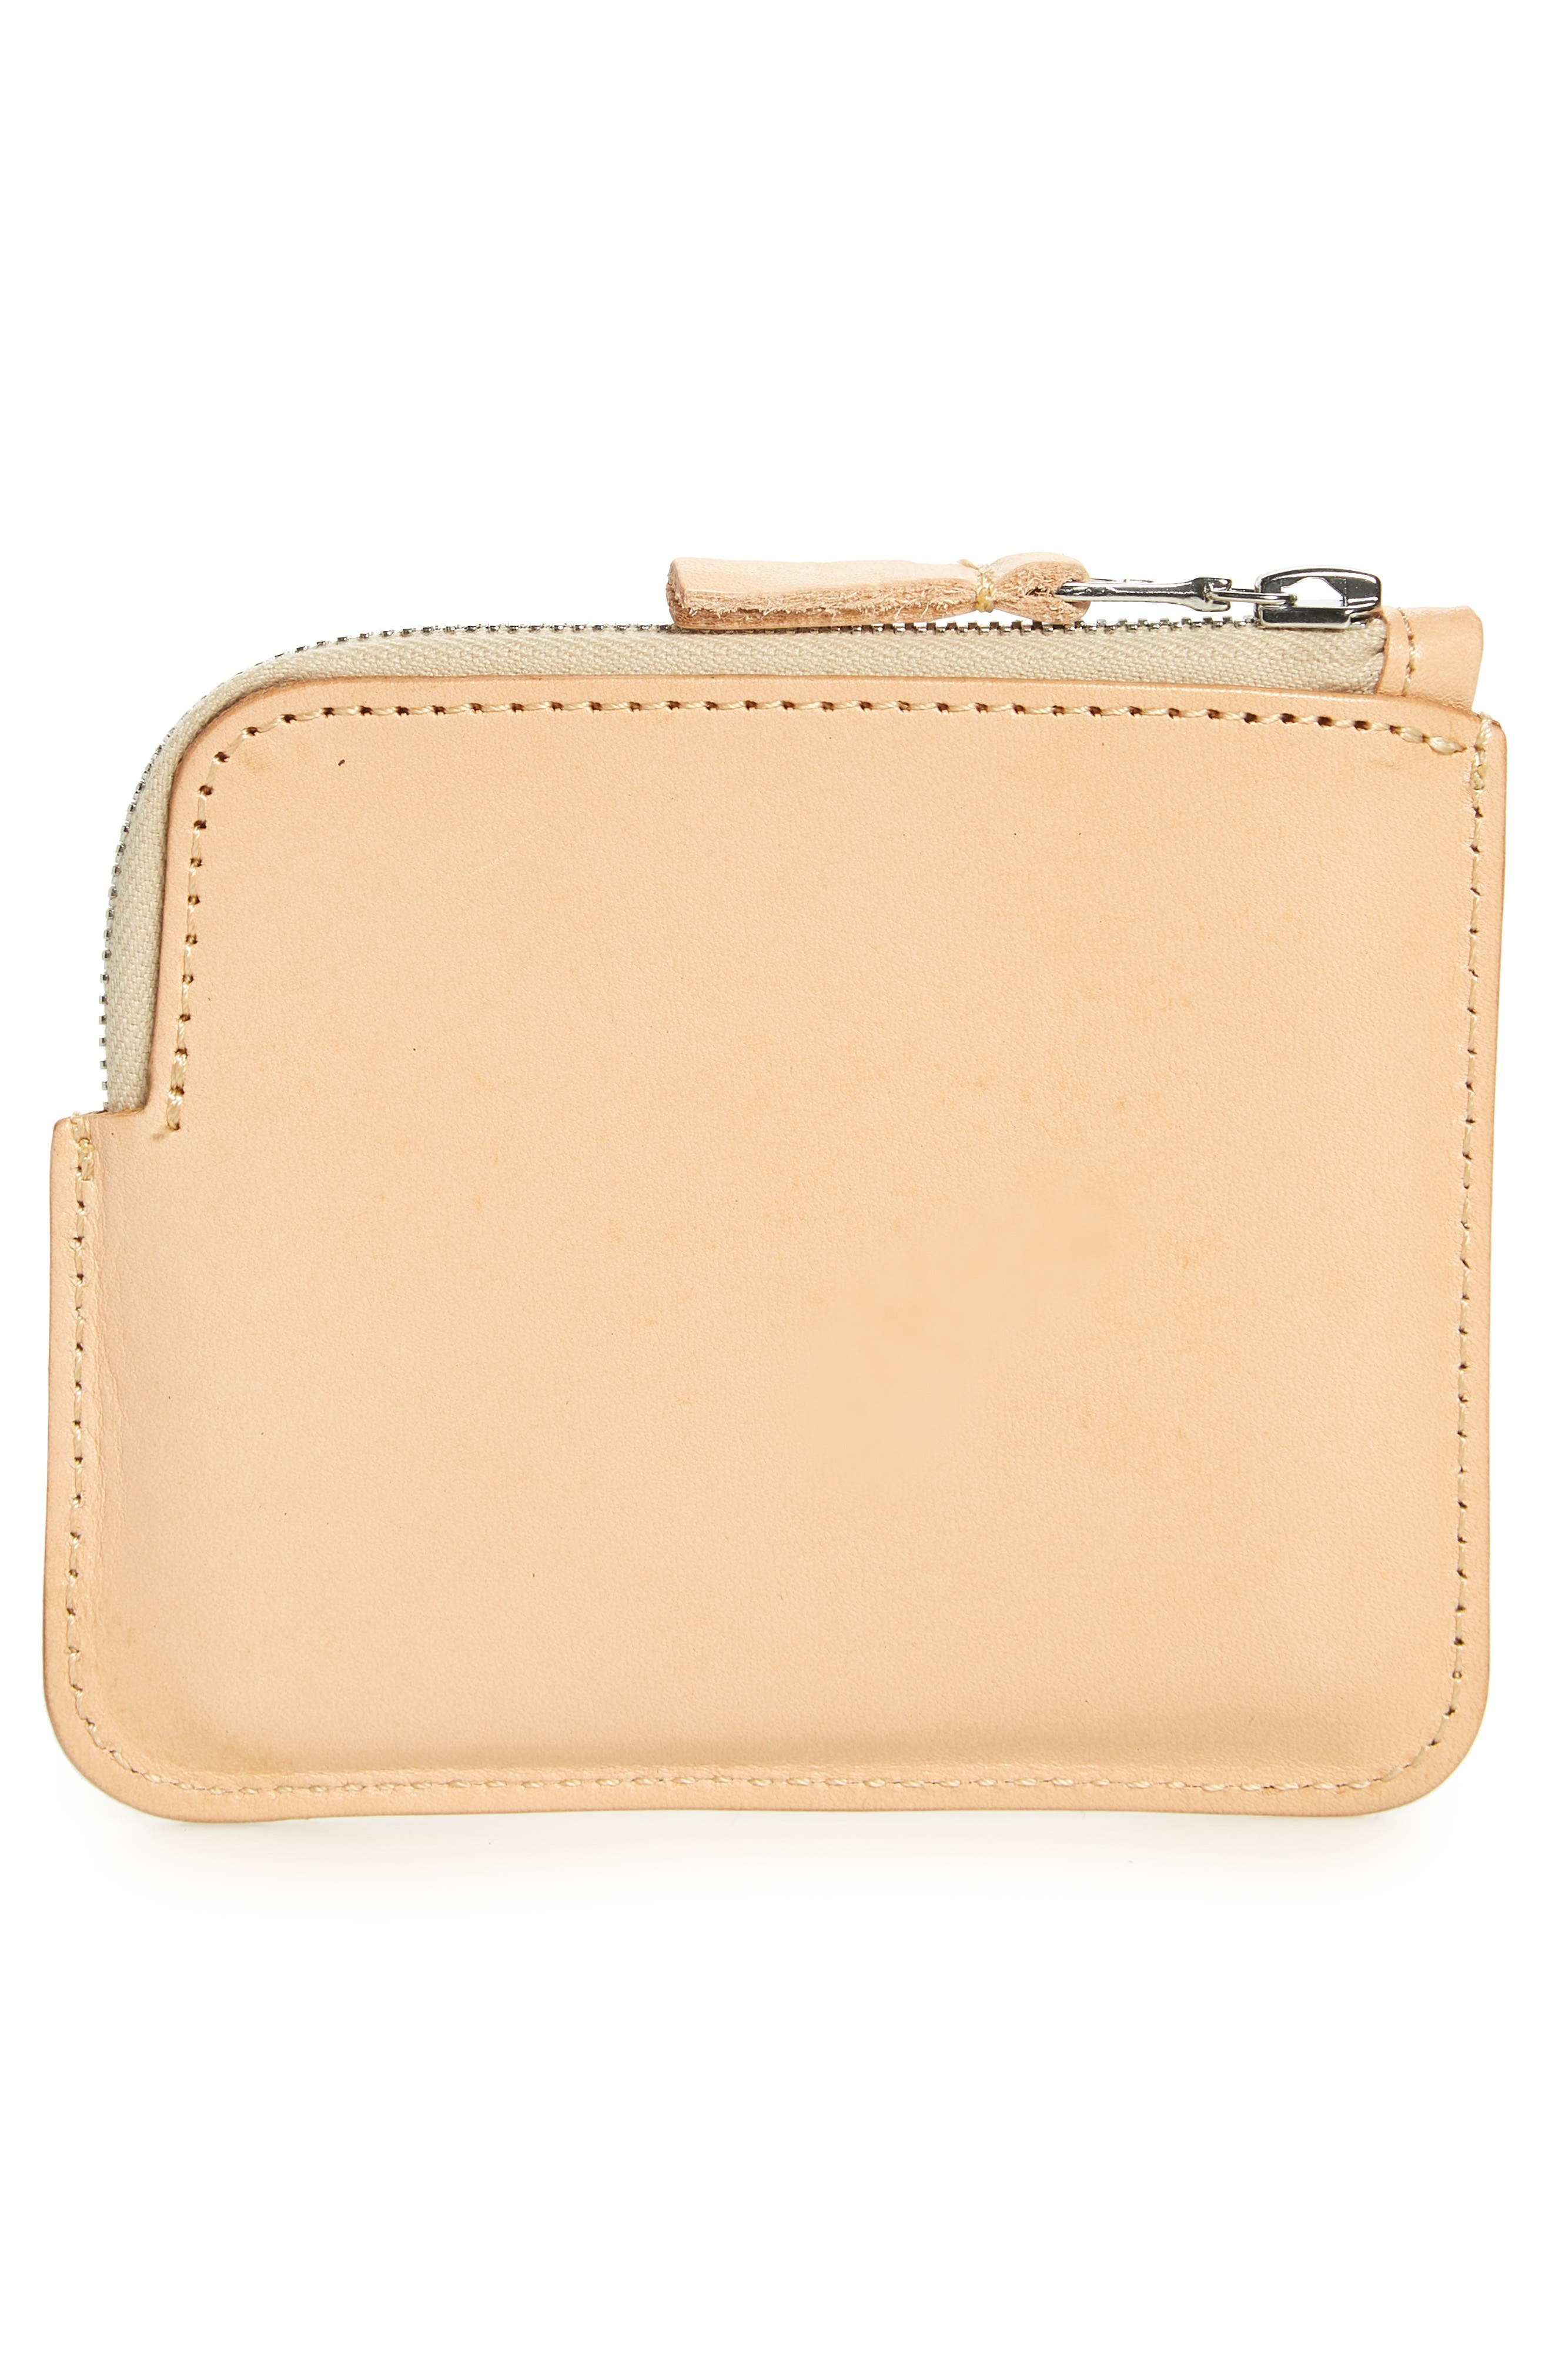 Leather Half Zip Wallet,                             Alternate thumbnail 2, color,                             Vegetable Tan